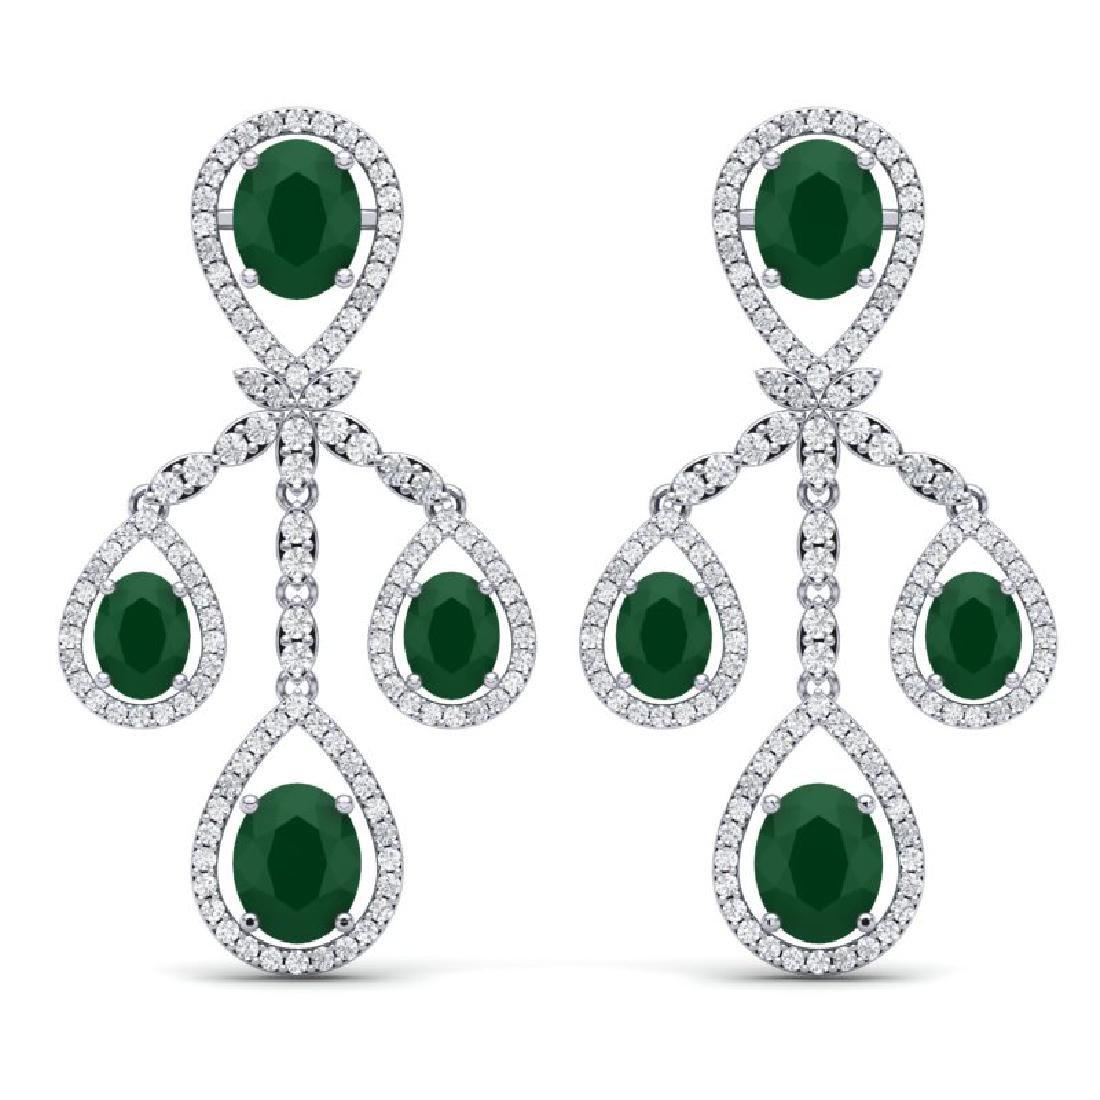 25.08 CTW Royalty Emerald & VS Diamond Earrings 18K